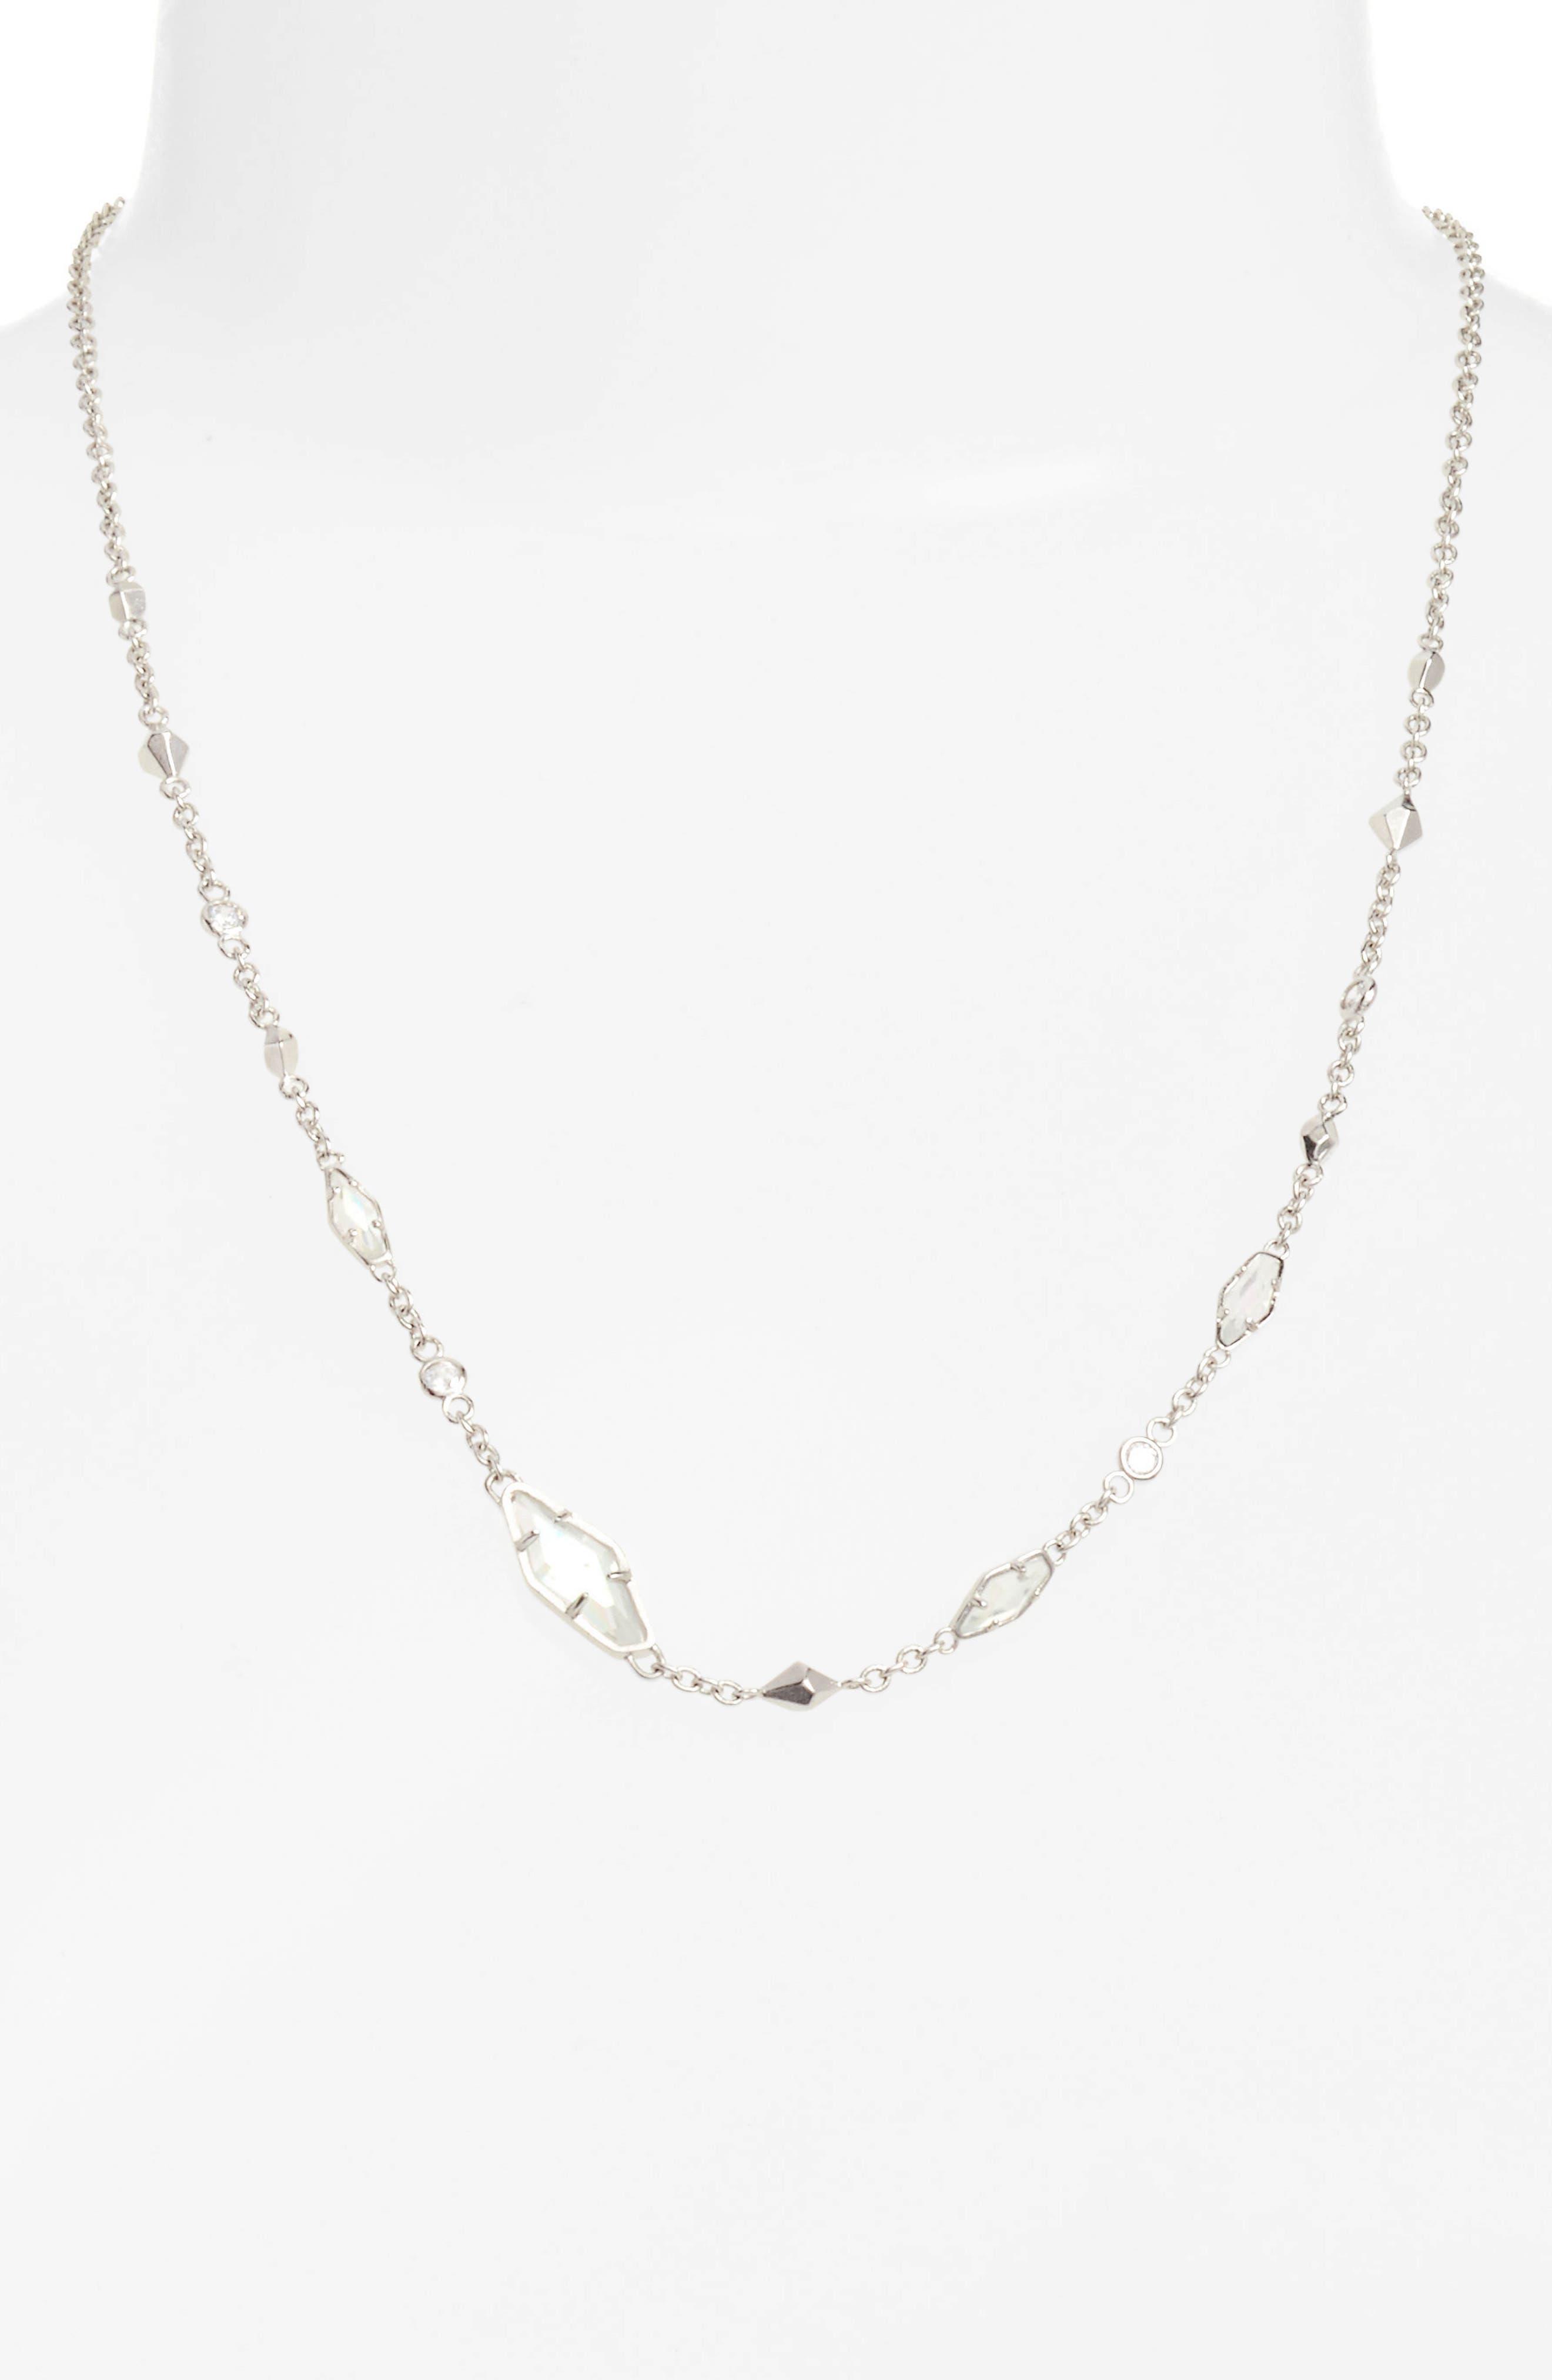 Alternate Image 1 Selected - Kendra Scott 'Debra' Jewel Necklace